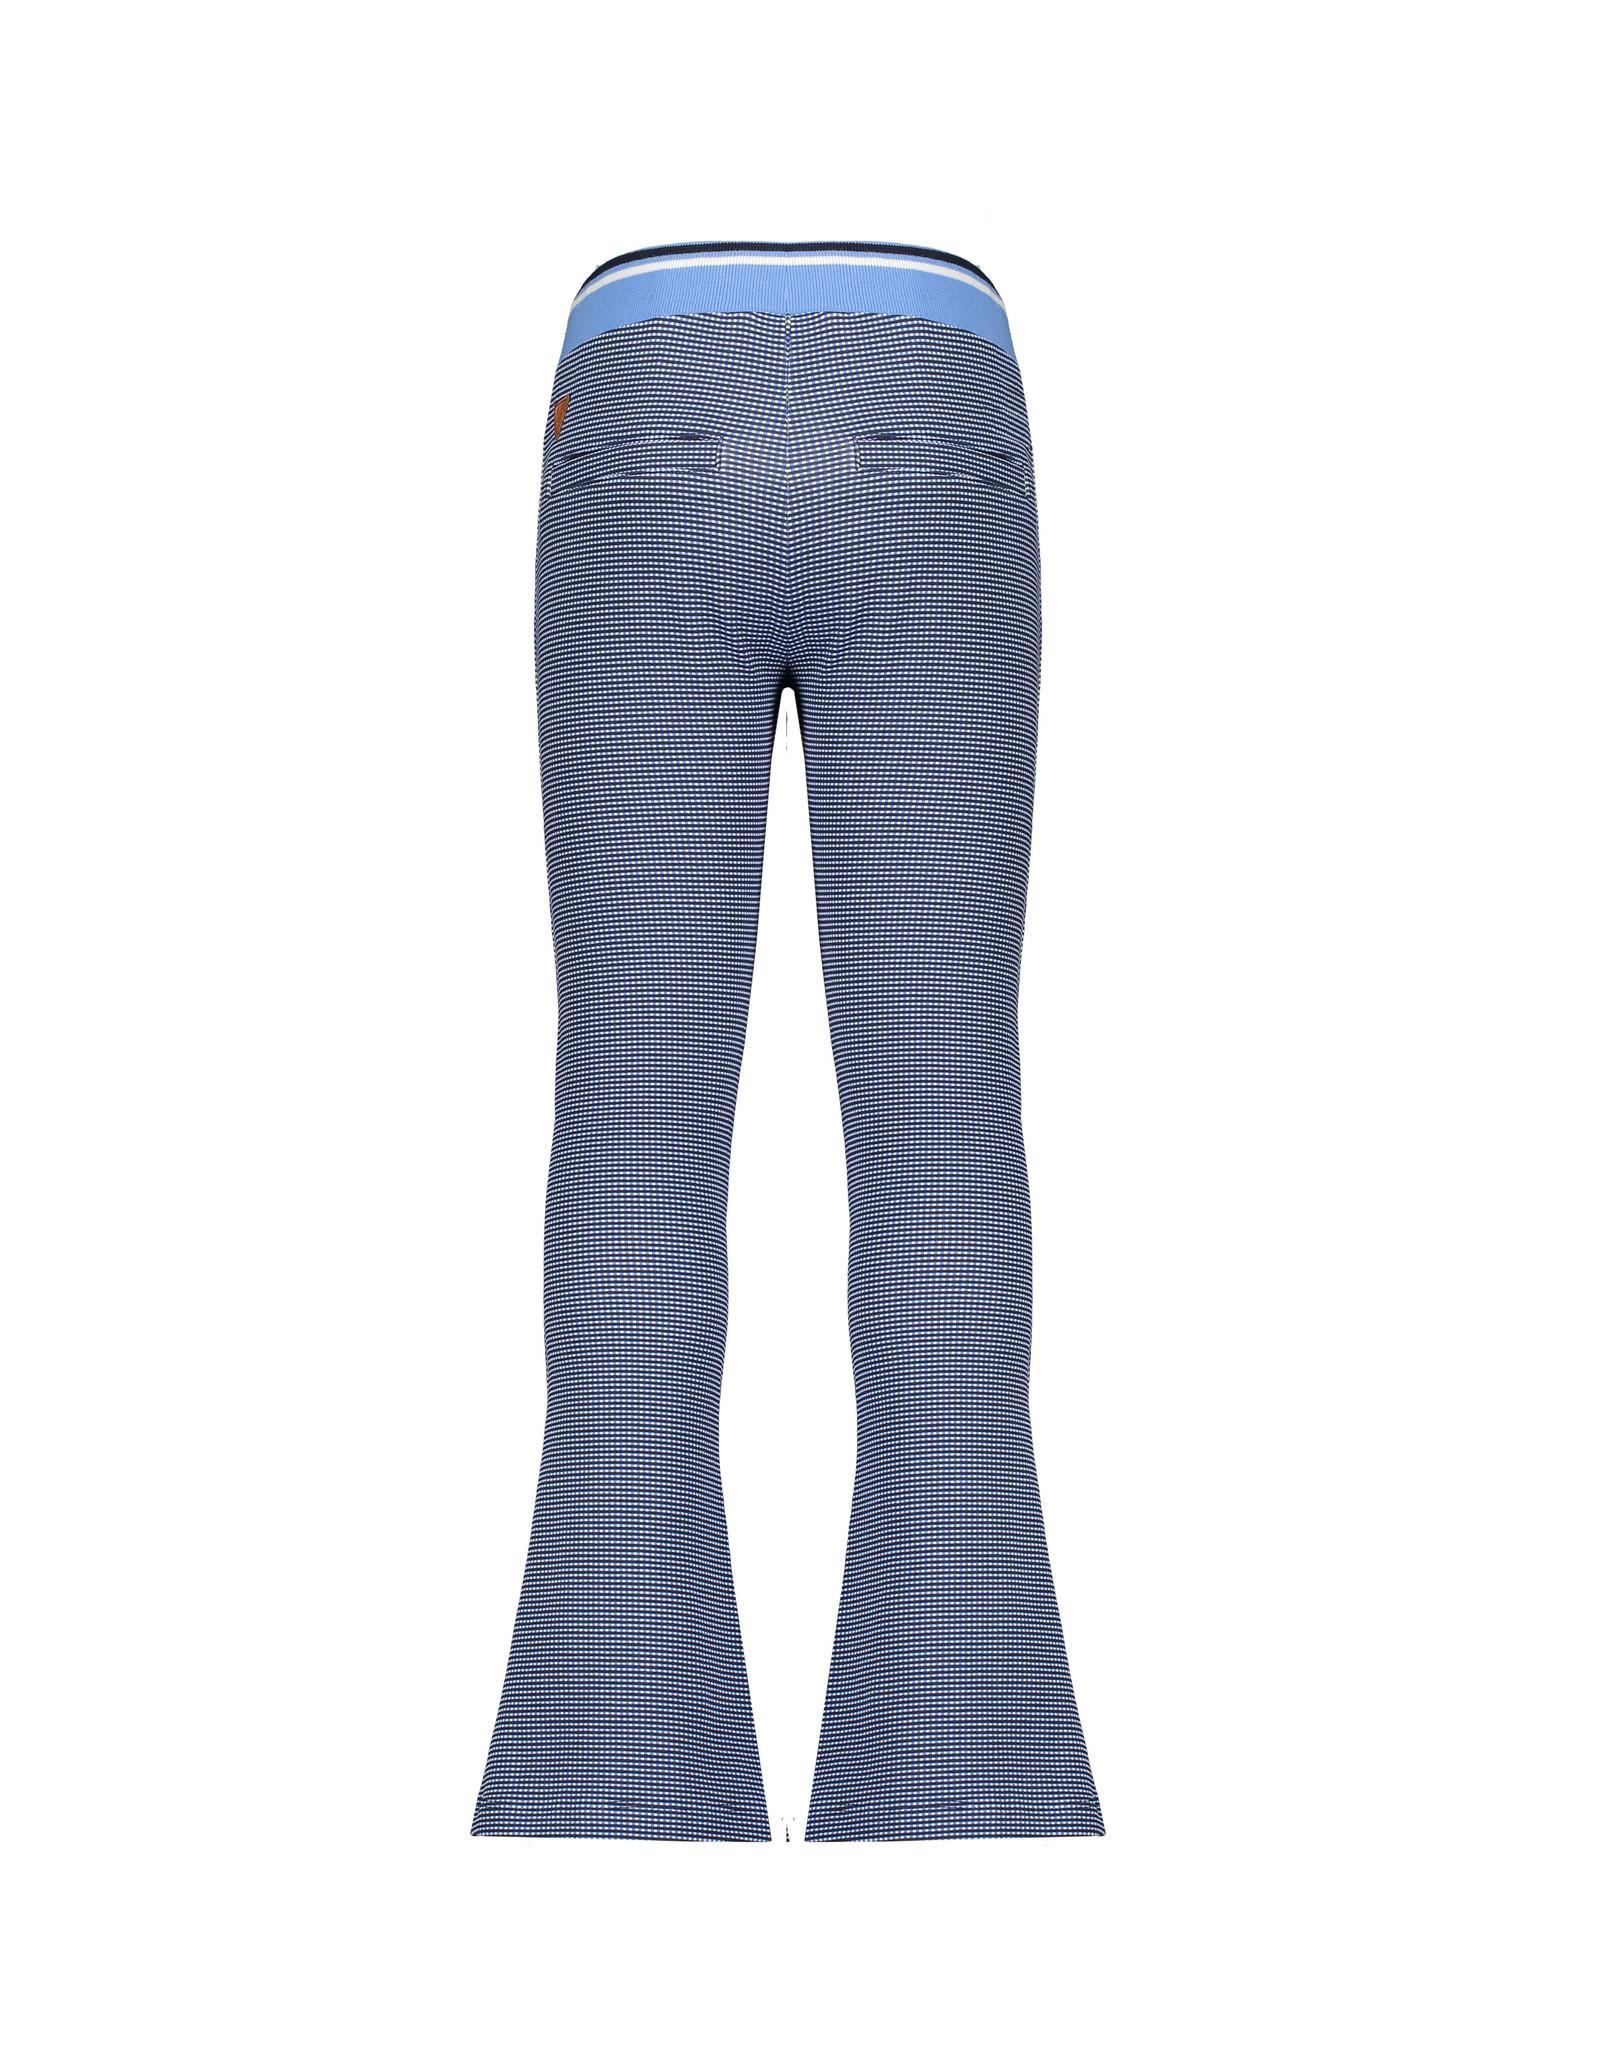 Nono Sahara flared pants in Gingham AOP check